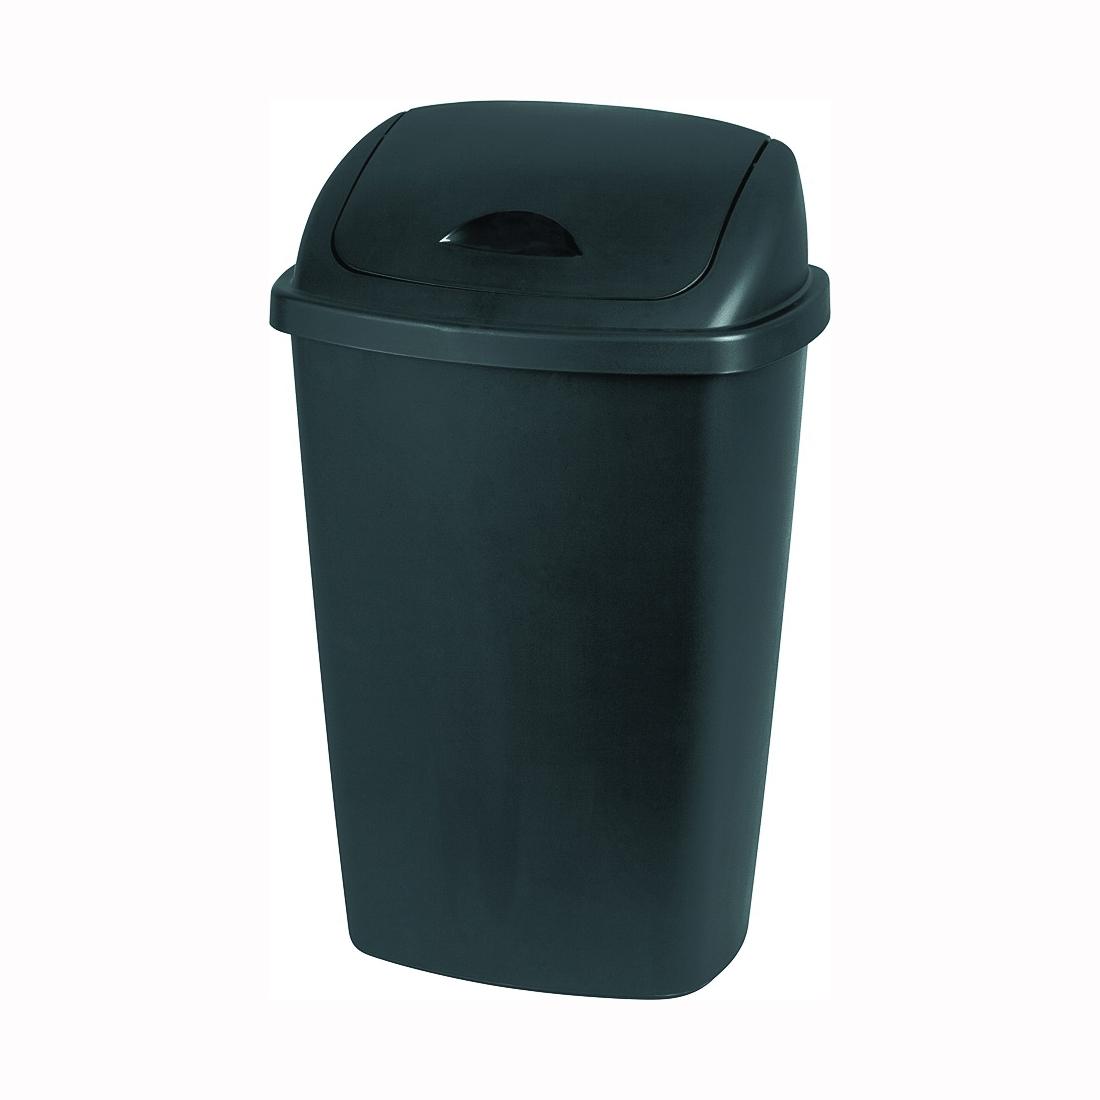 Picture of Sterilite 10889004 Waste Basket, 13.2 gal Capacity, Plastic, Black, 13-1/2 in W, 17-1/4 in D, 27 in H